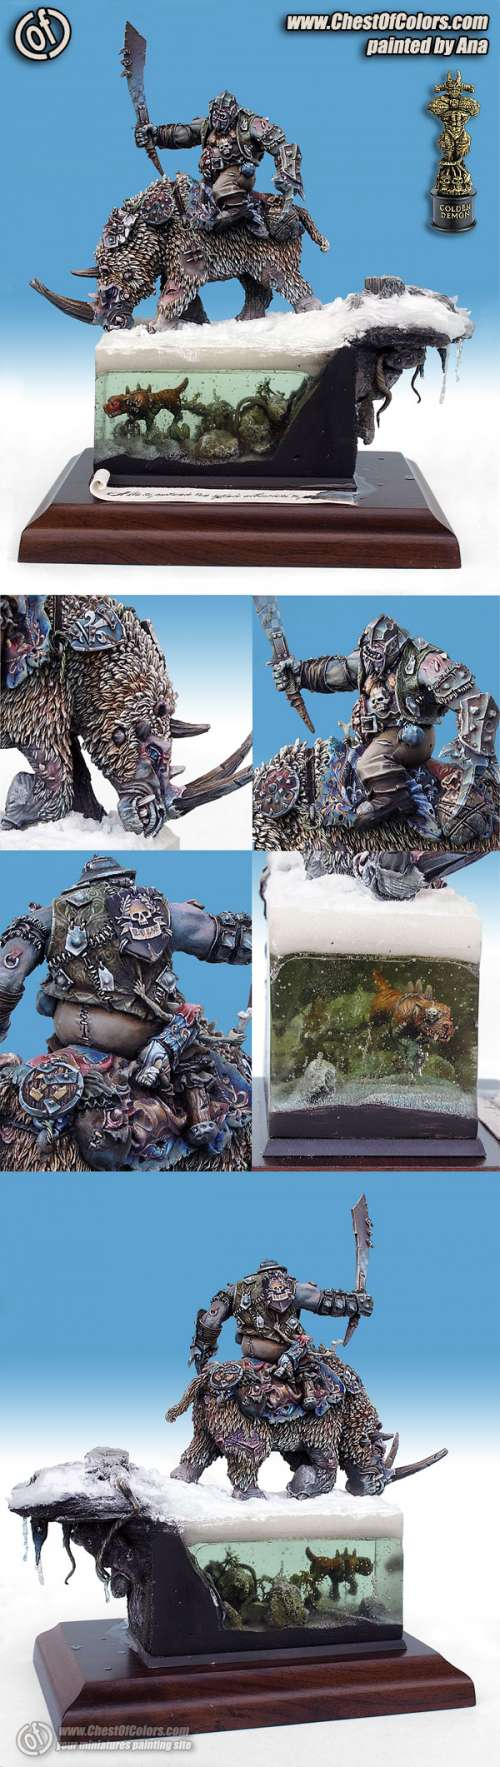 GOLDEN DEMON POLAND 2007 - Gold in Warhammer Monster - Ogre on Rhinox